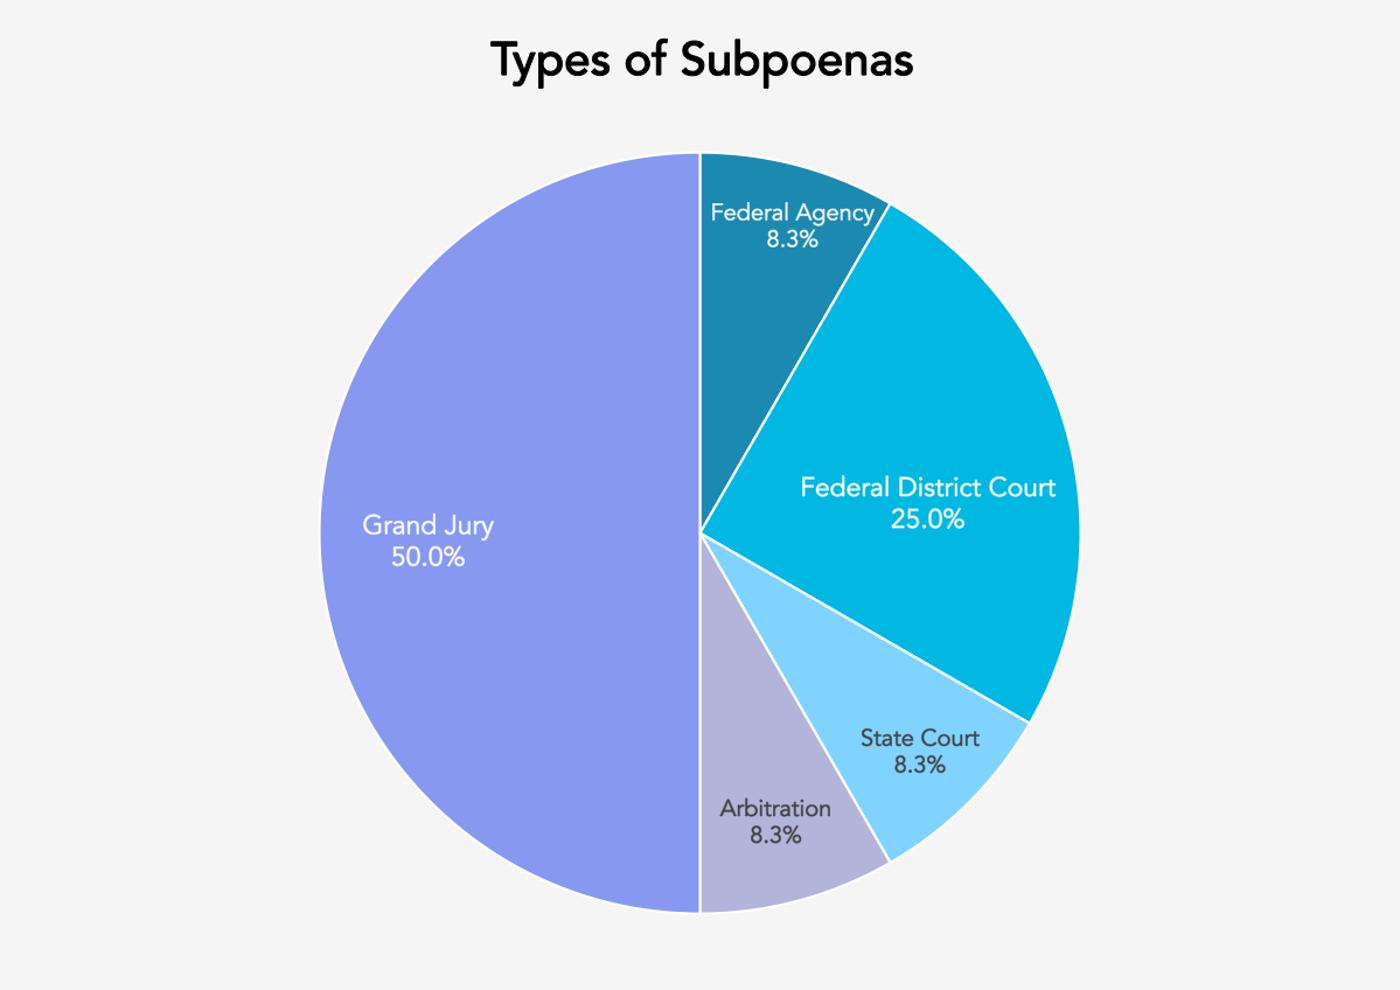 Types of Subpoenas